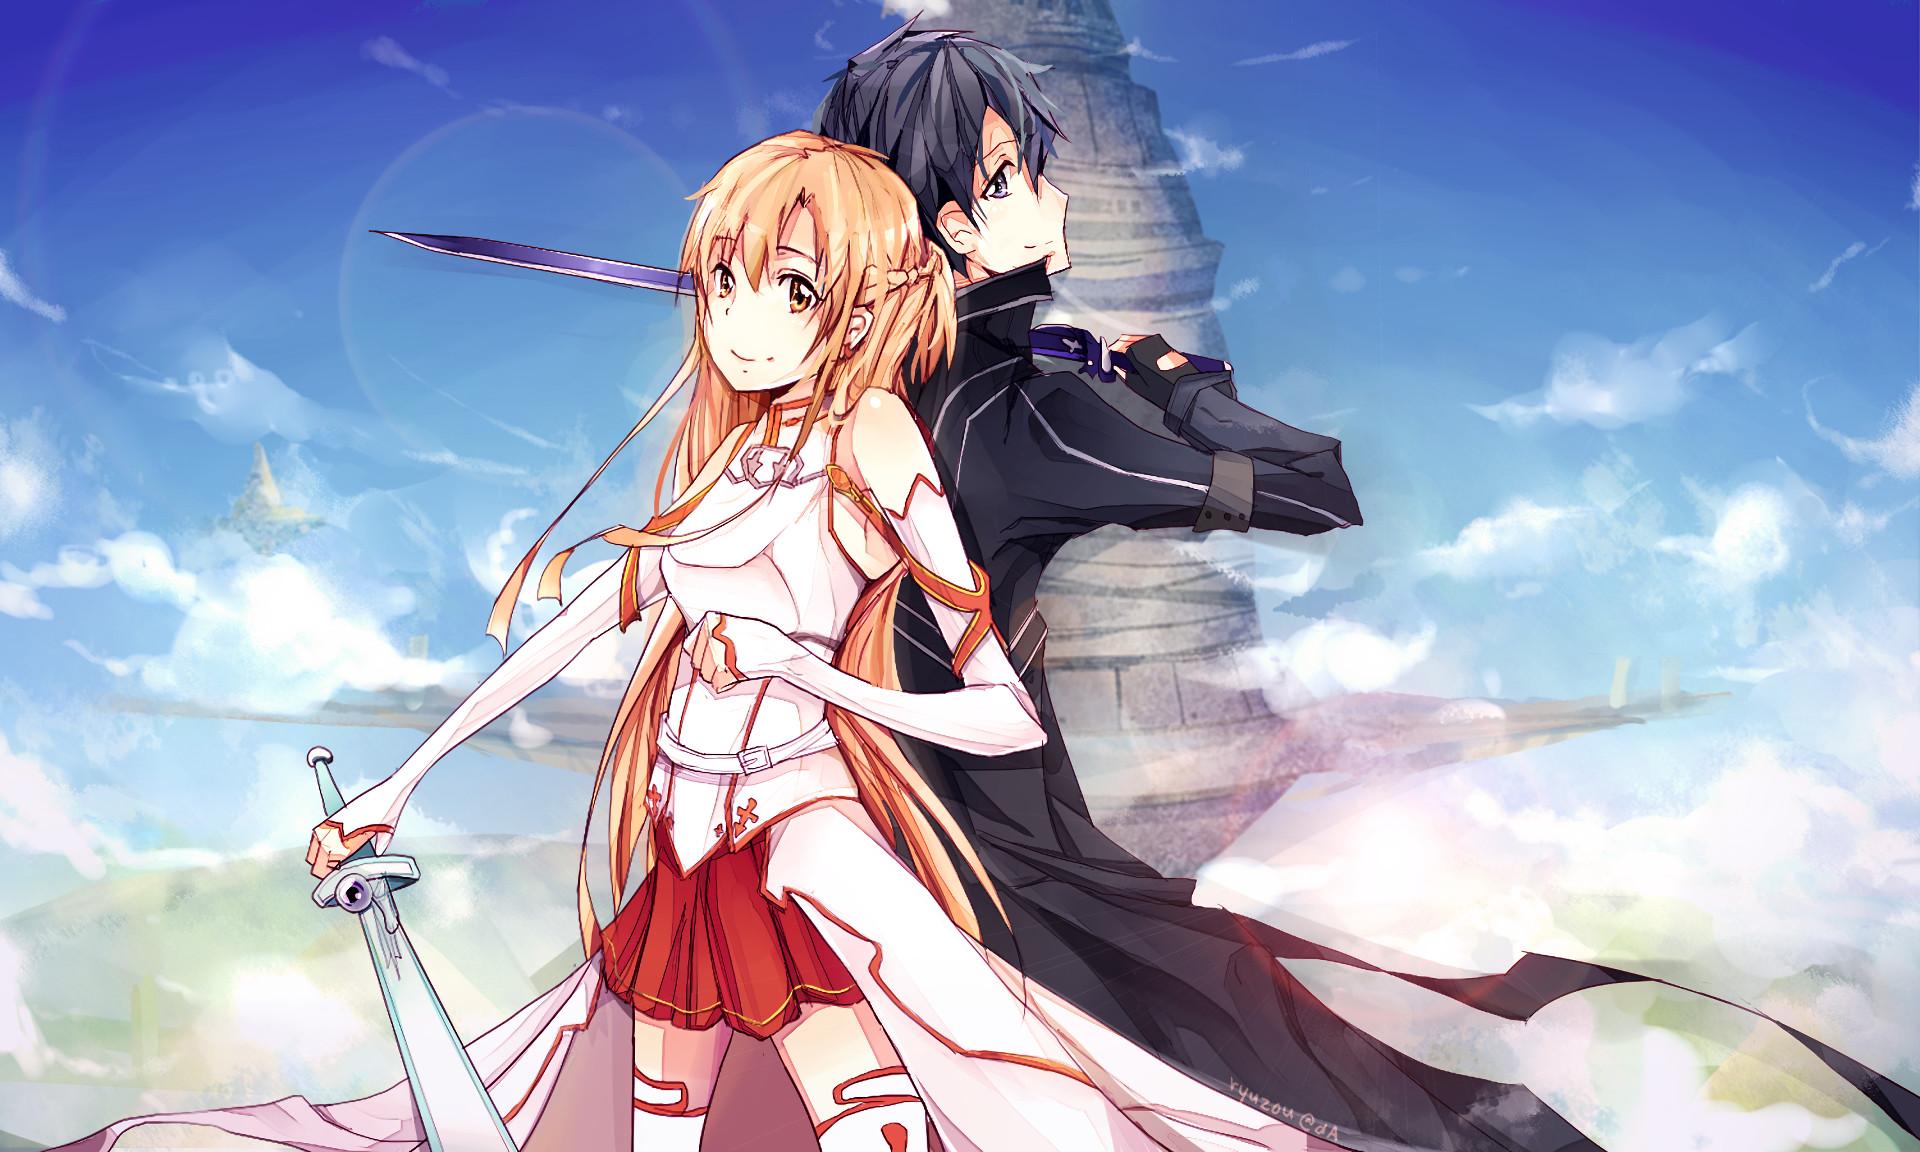 Anime – Sword Art Online Kirito (Sword Art Online) Asuna Yuuki Kazuto  Kirigaya Wallpaper